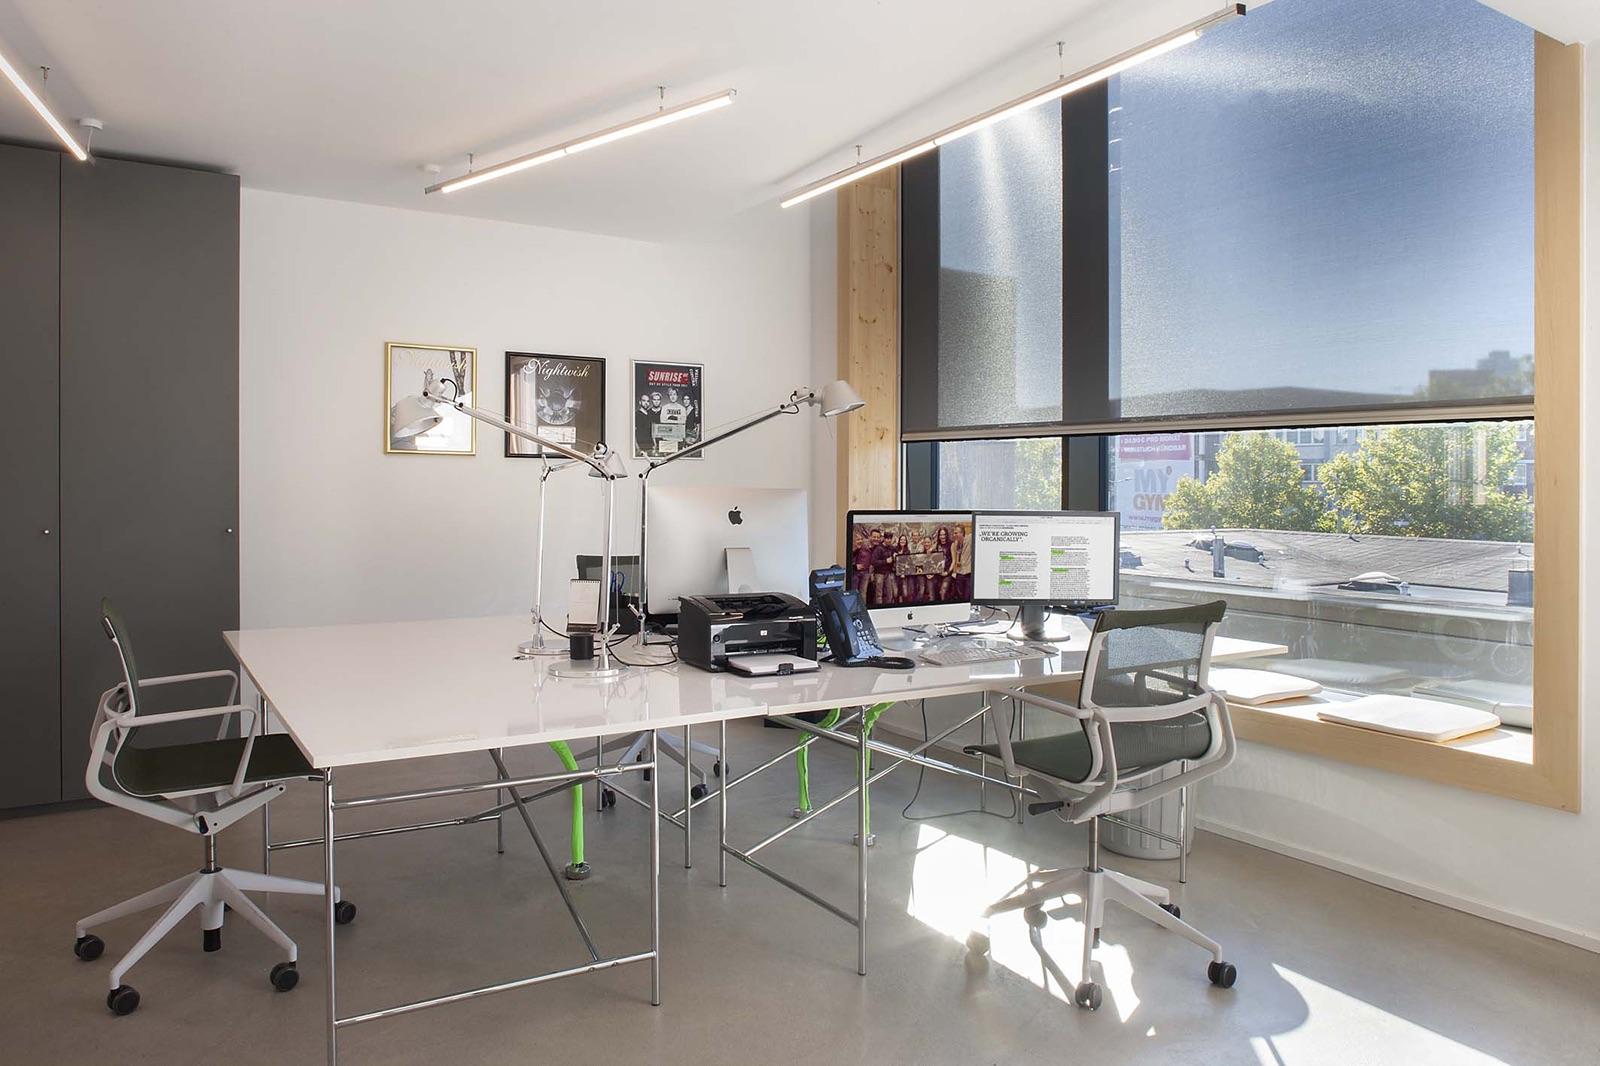 contra-bochum-office-2